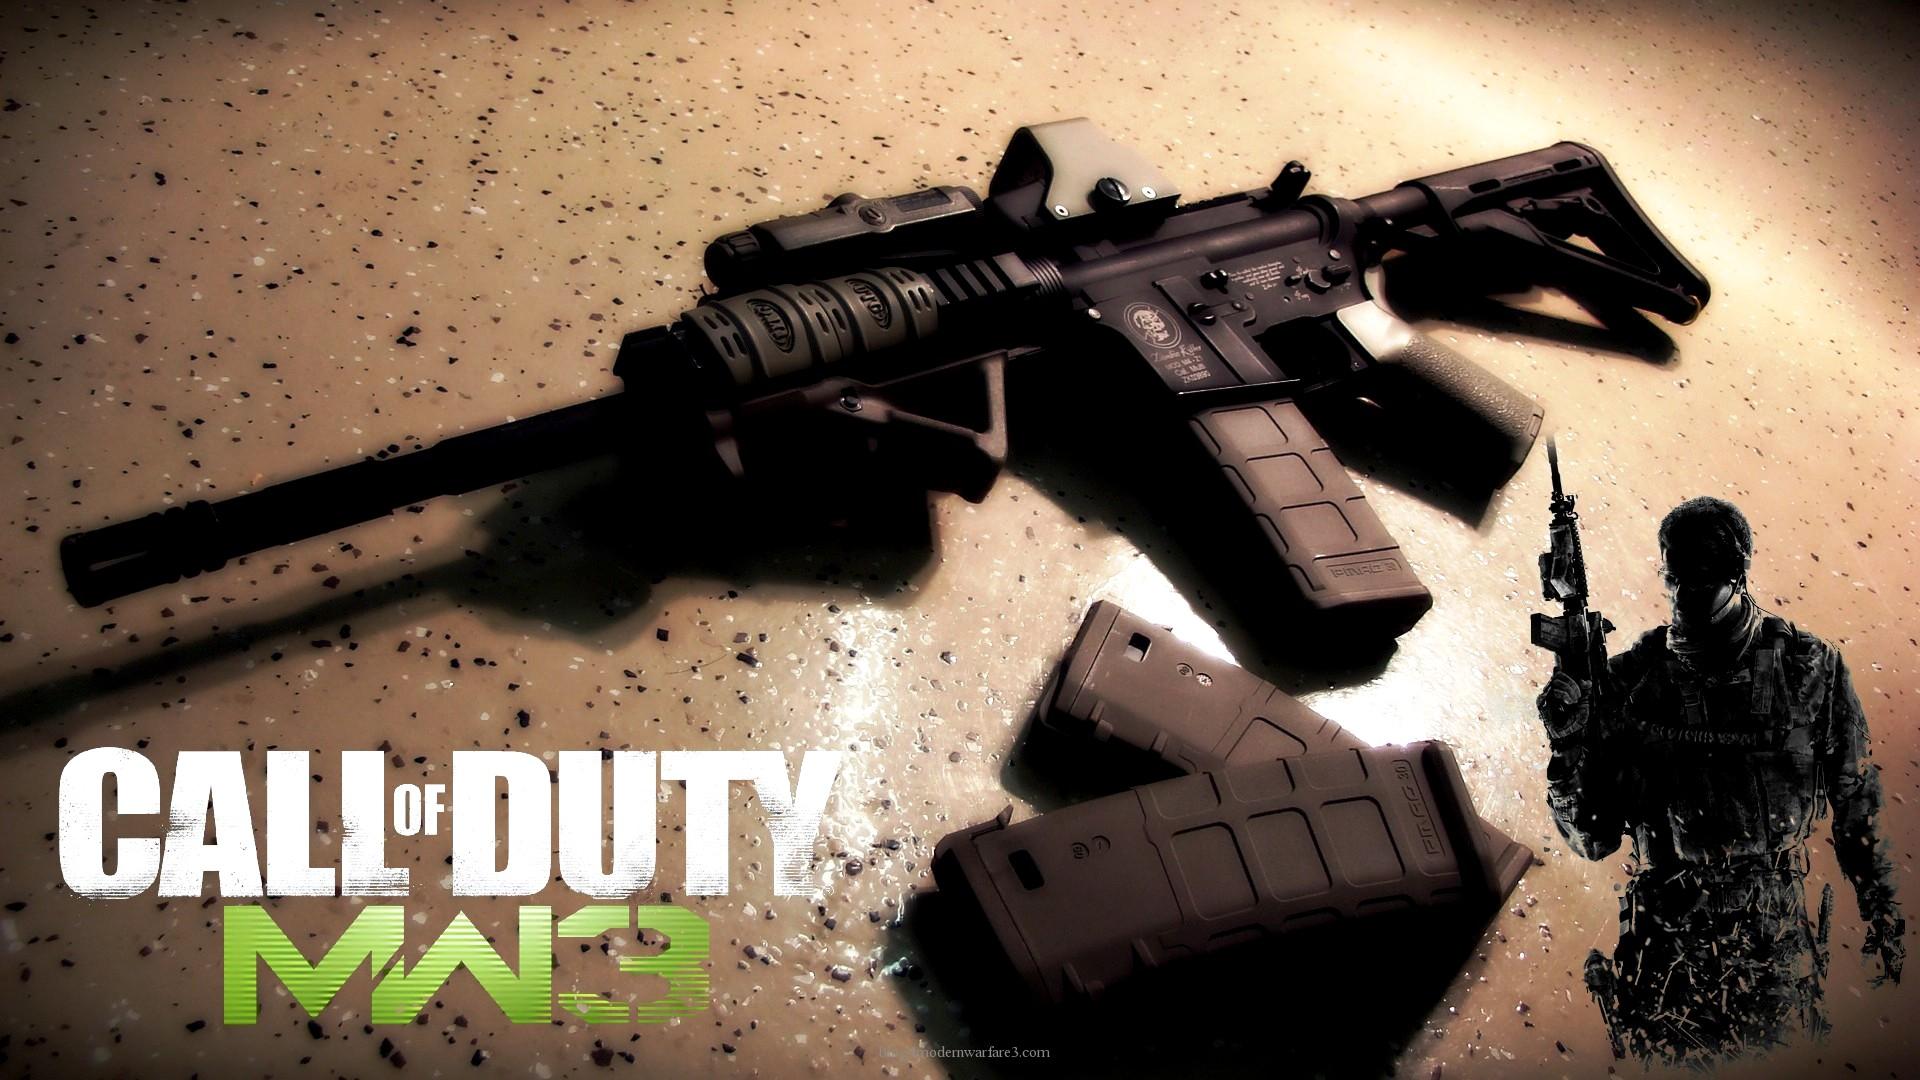 Call Of Duty Modern Warfare Wallpapers 35 Wallpapers